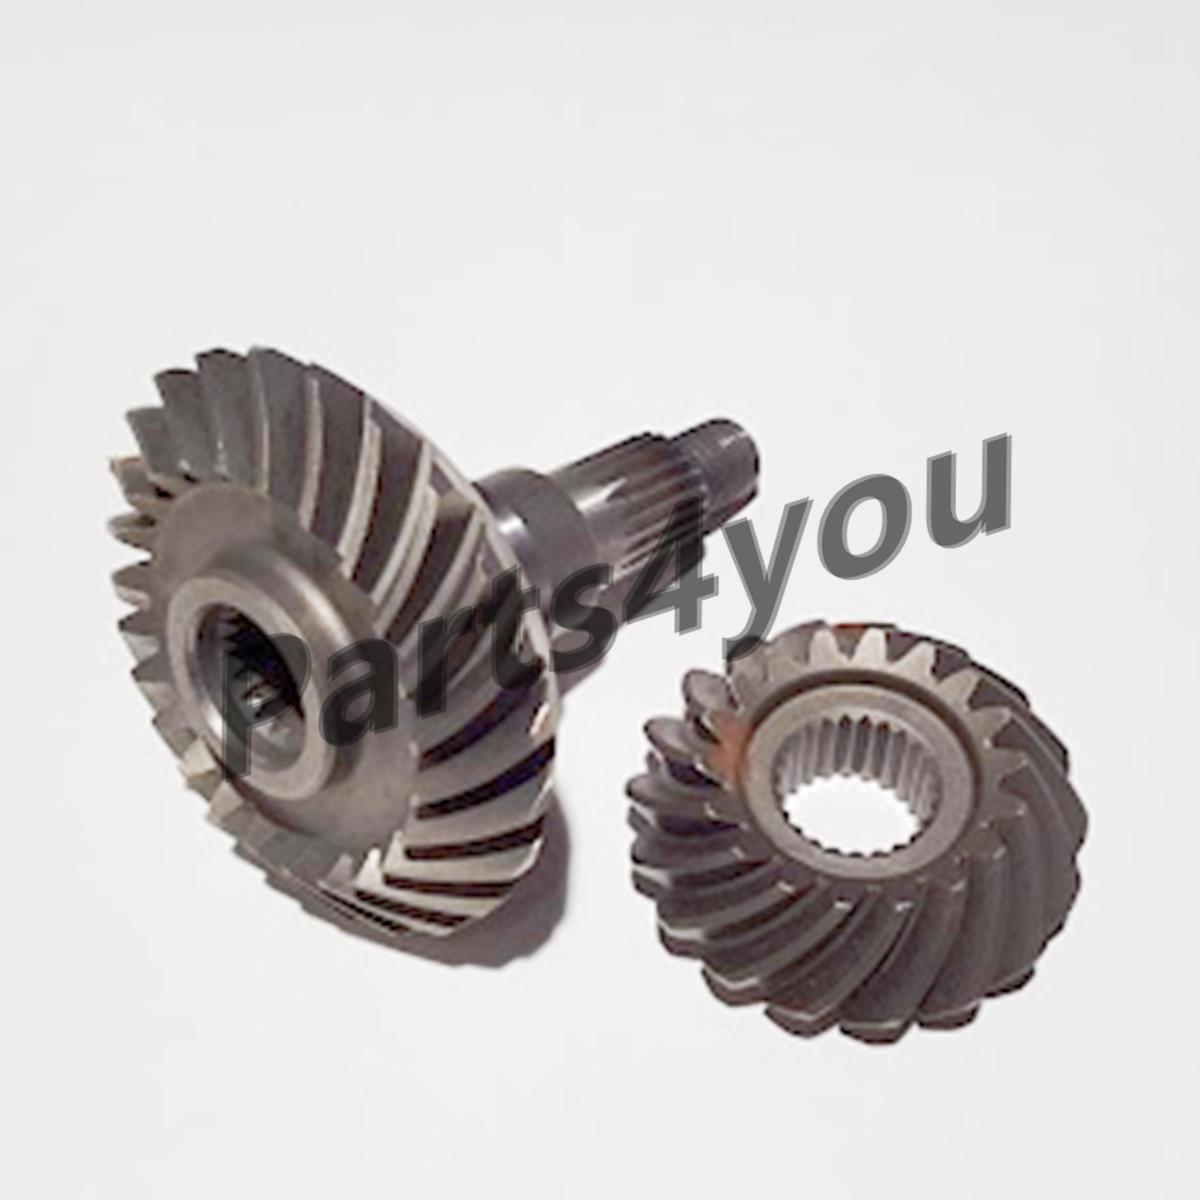 Drive Driven Bevel Gear for CFmoto ATV UTV 196S U6 X6 CF188 500cc 600cc CF500 CF600 X5 0180-0622A0 enlarge